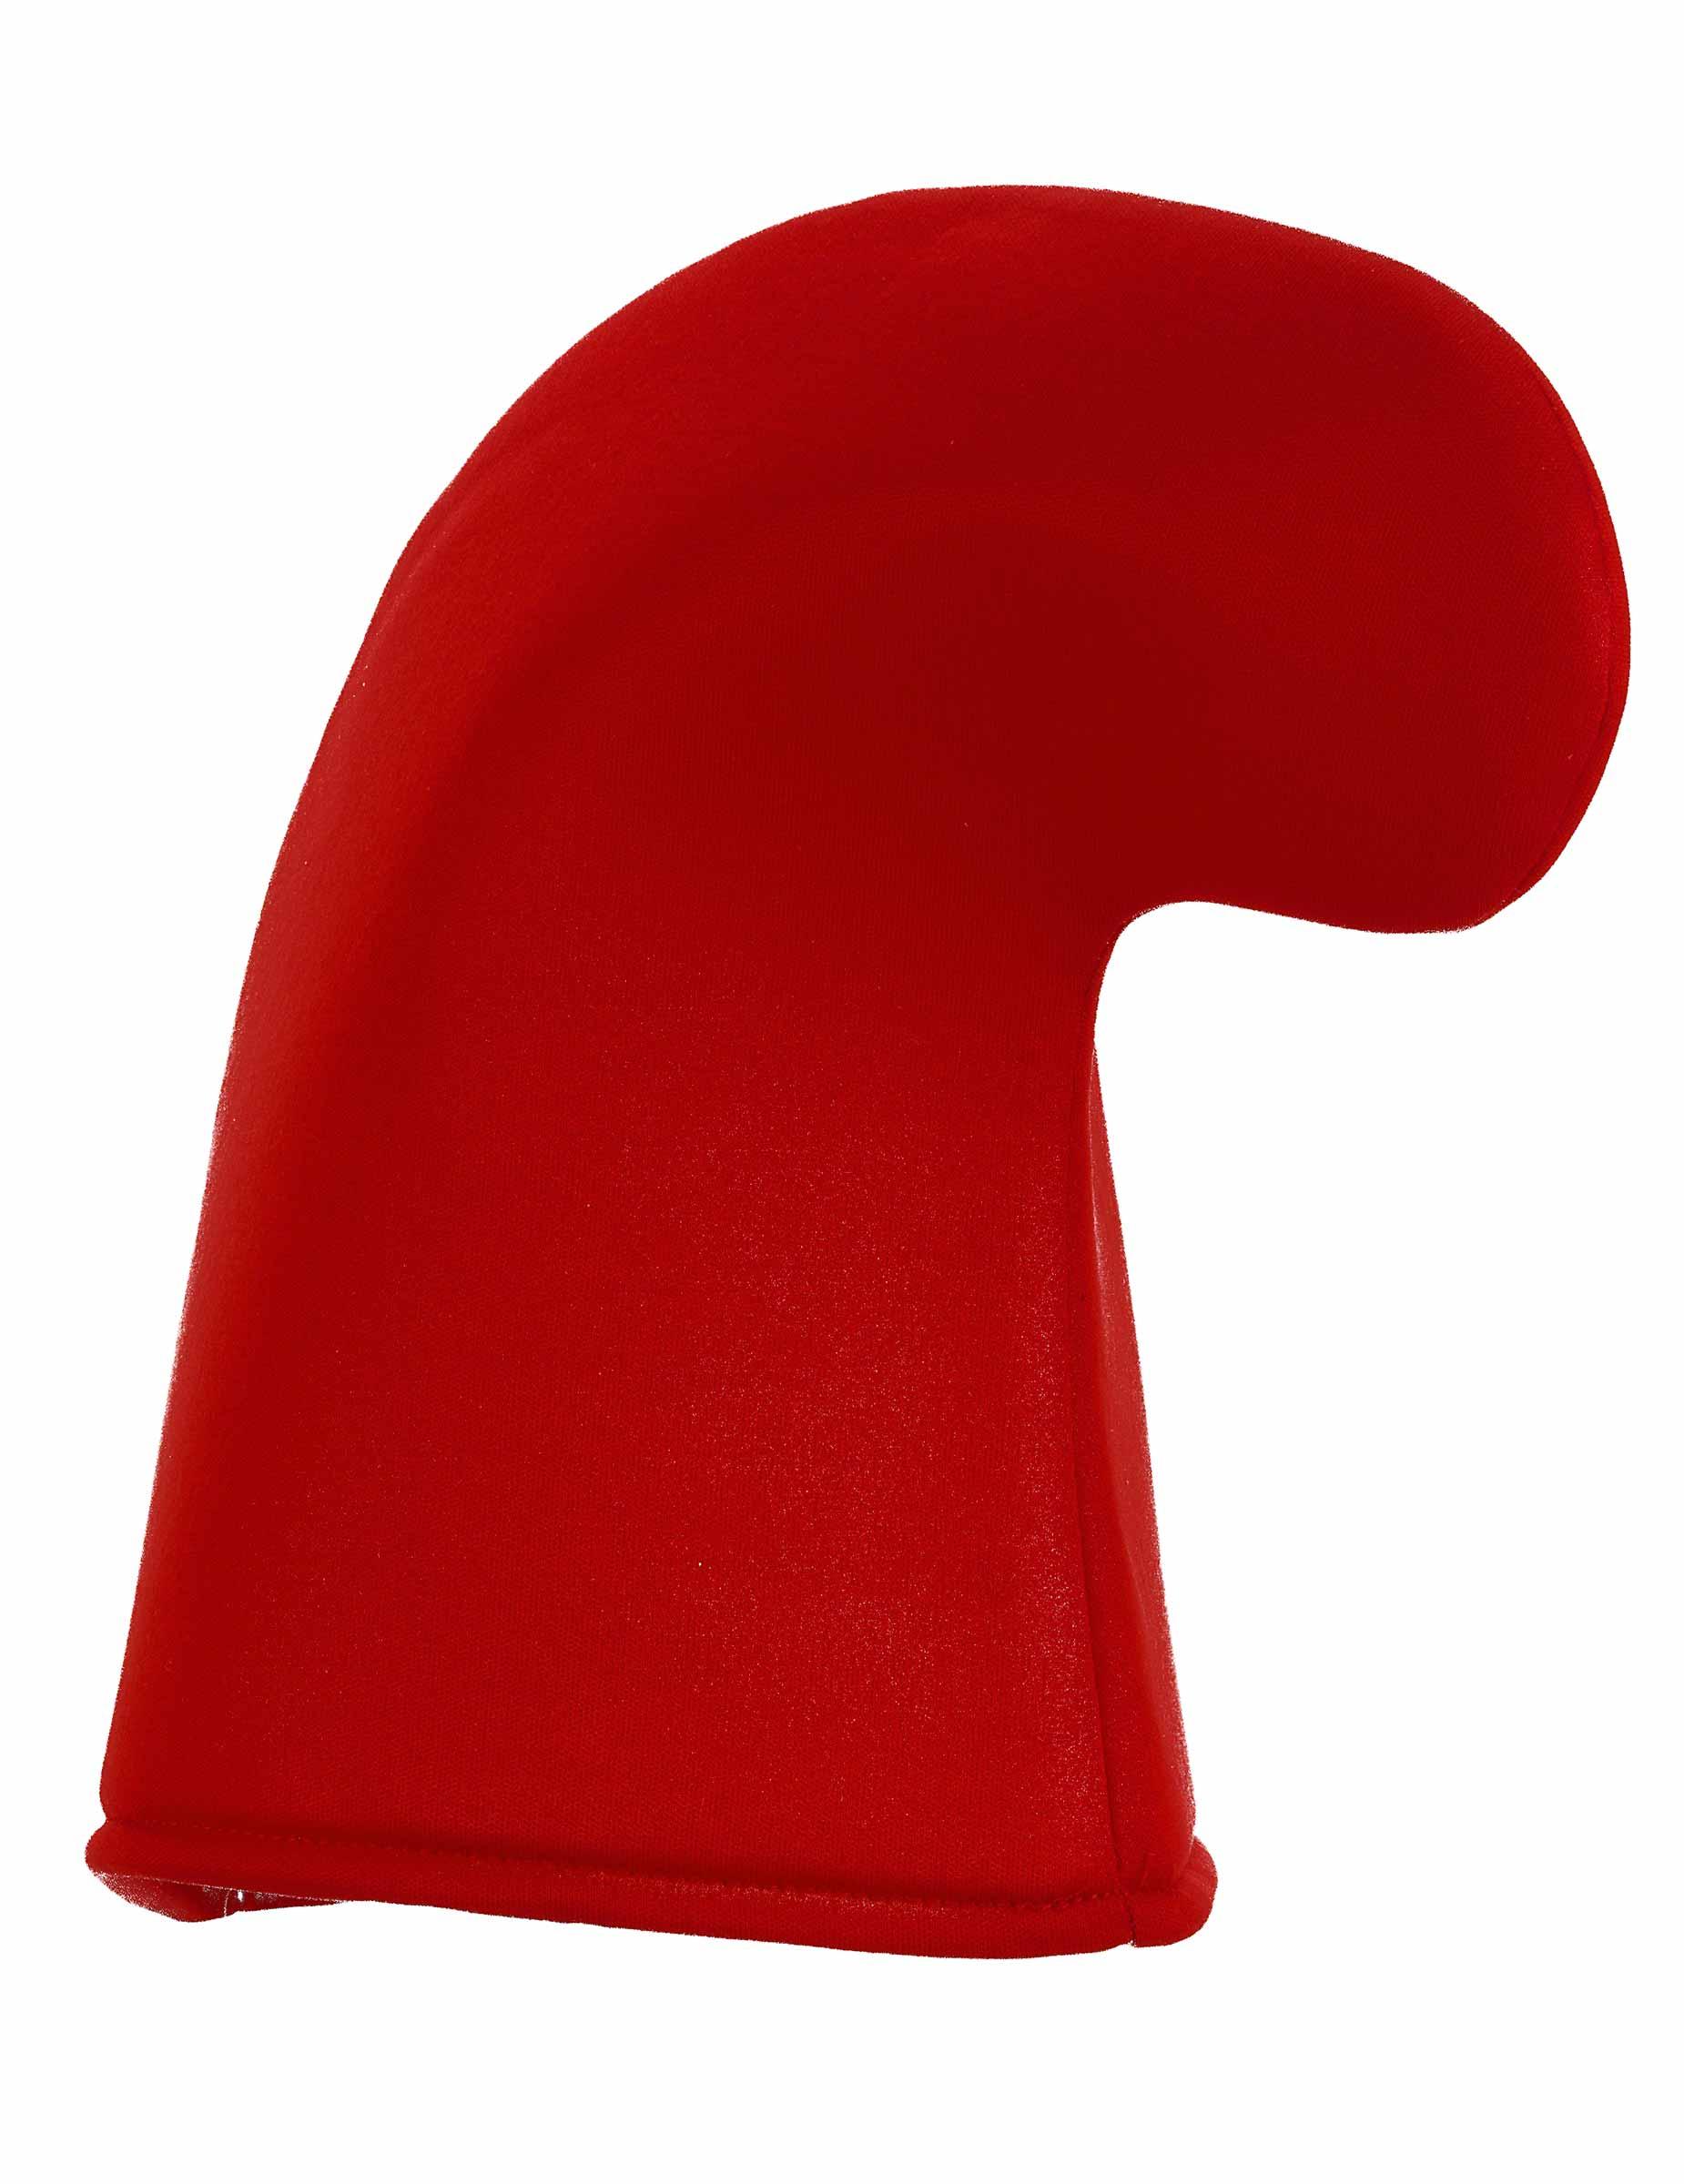 Cappello da elfo rosso adulto  Cappelli 412de4c32757